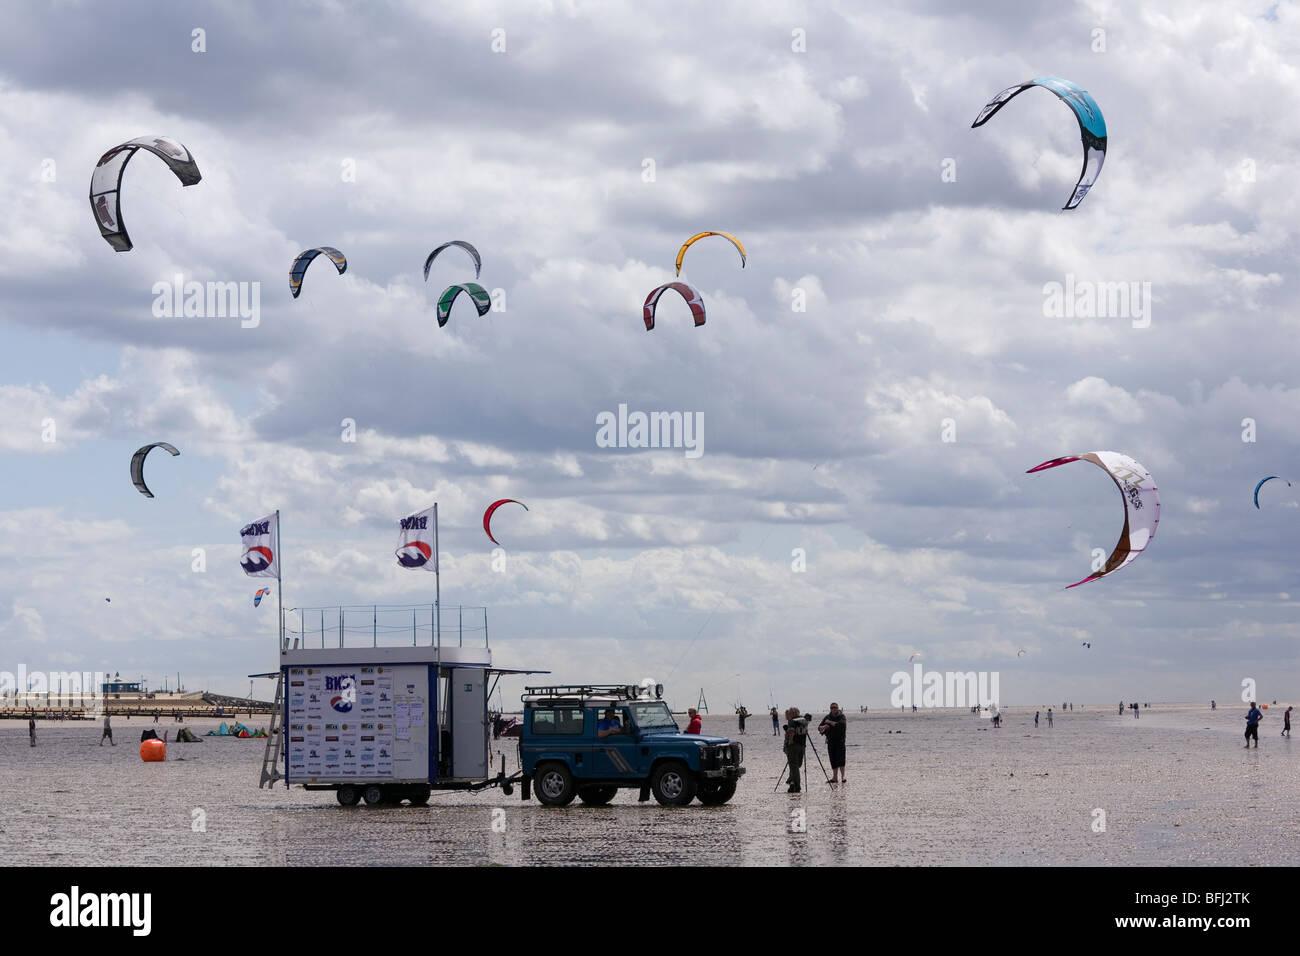 Part of the BKSA Kitesurfing competition at Hunstanton, Norfolk. - Stock Image